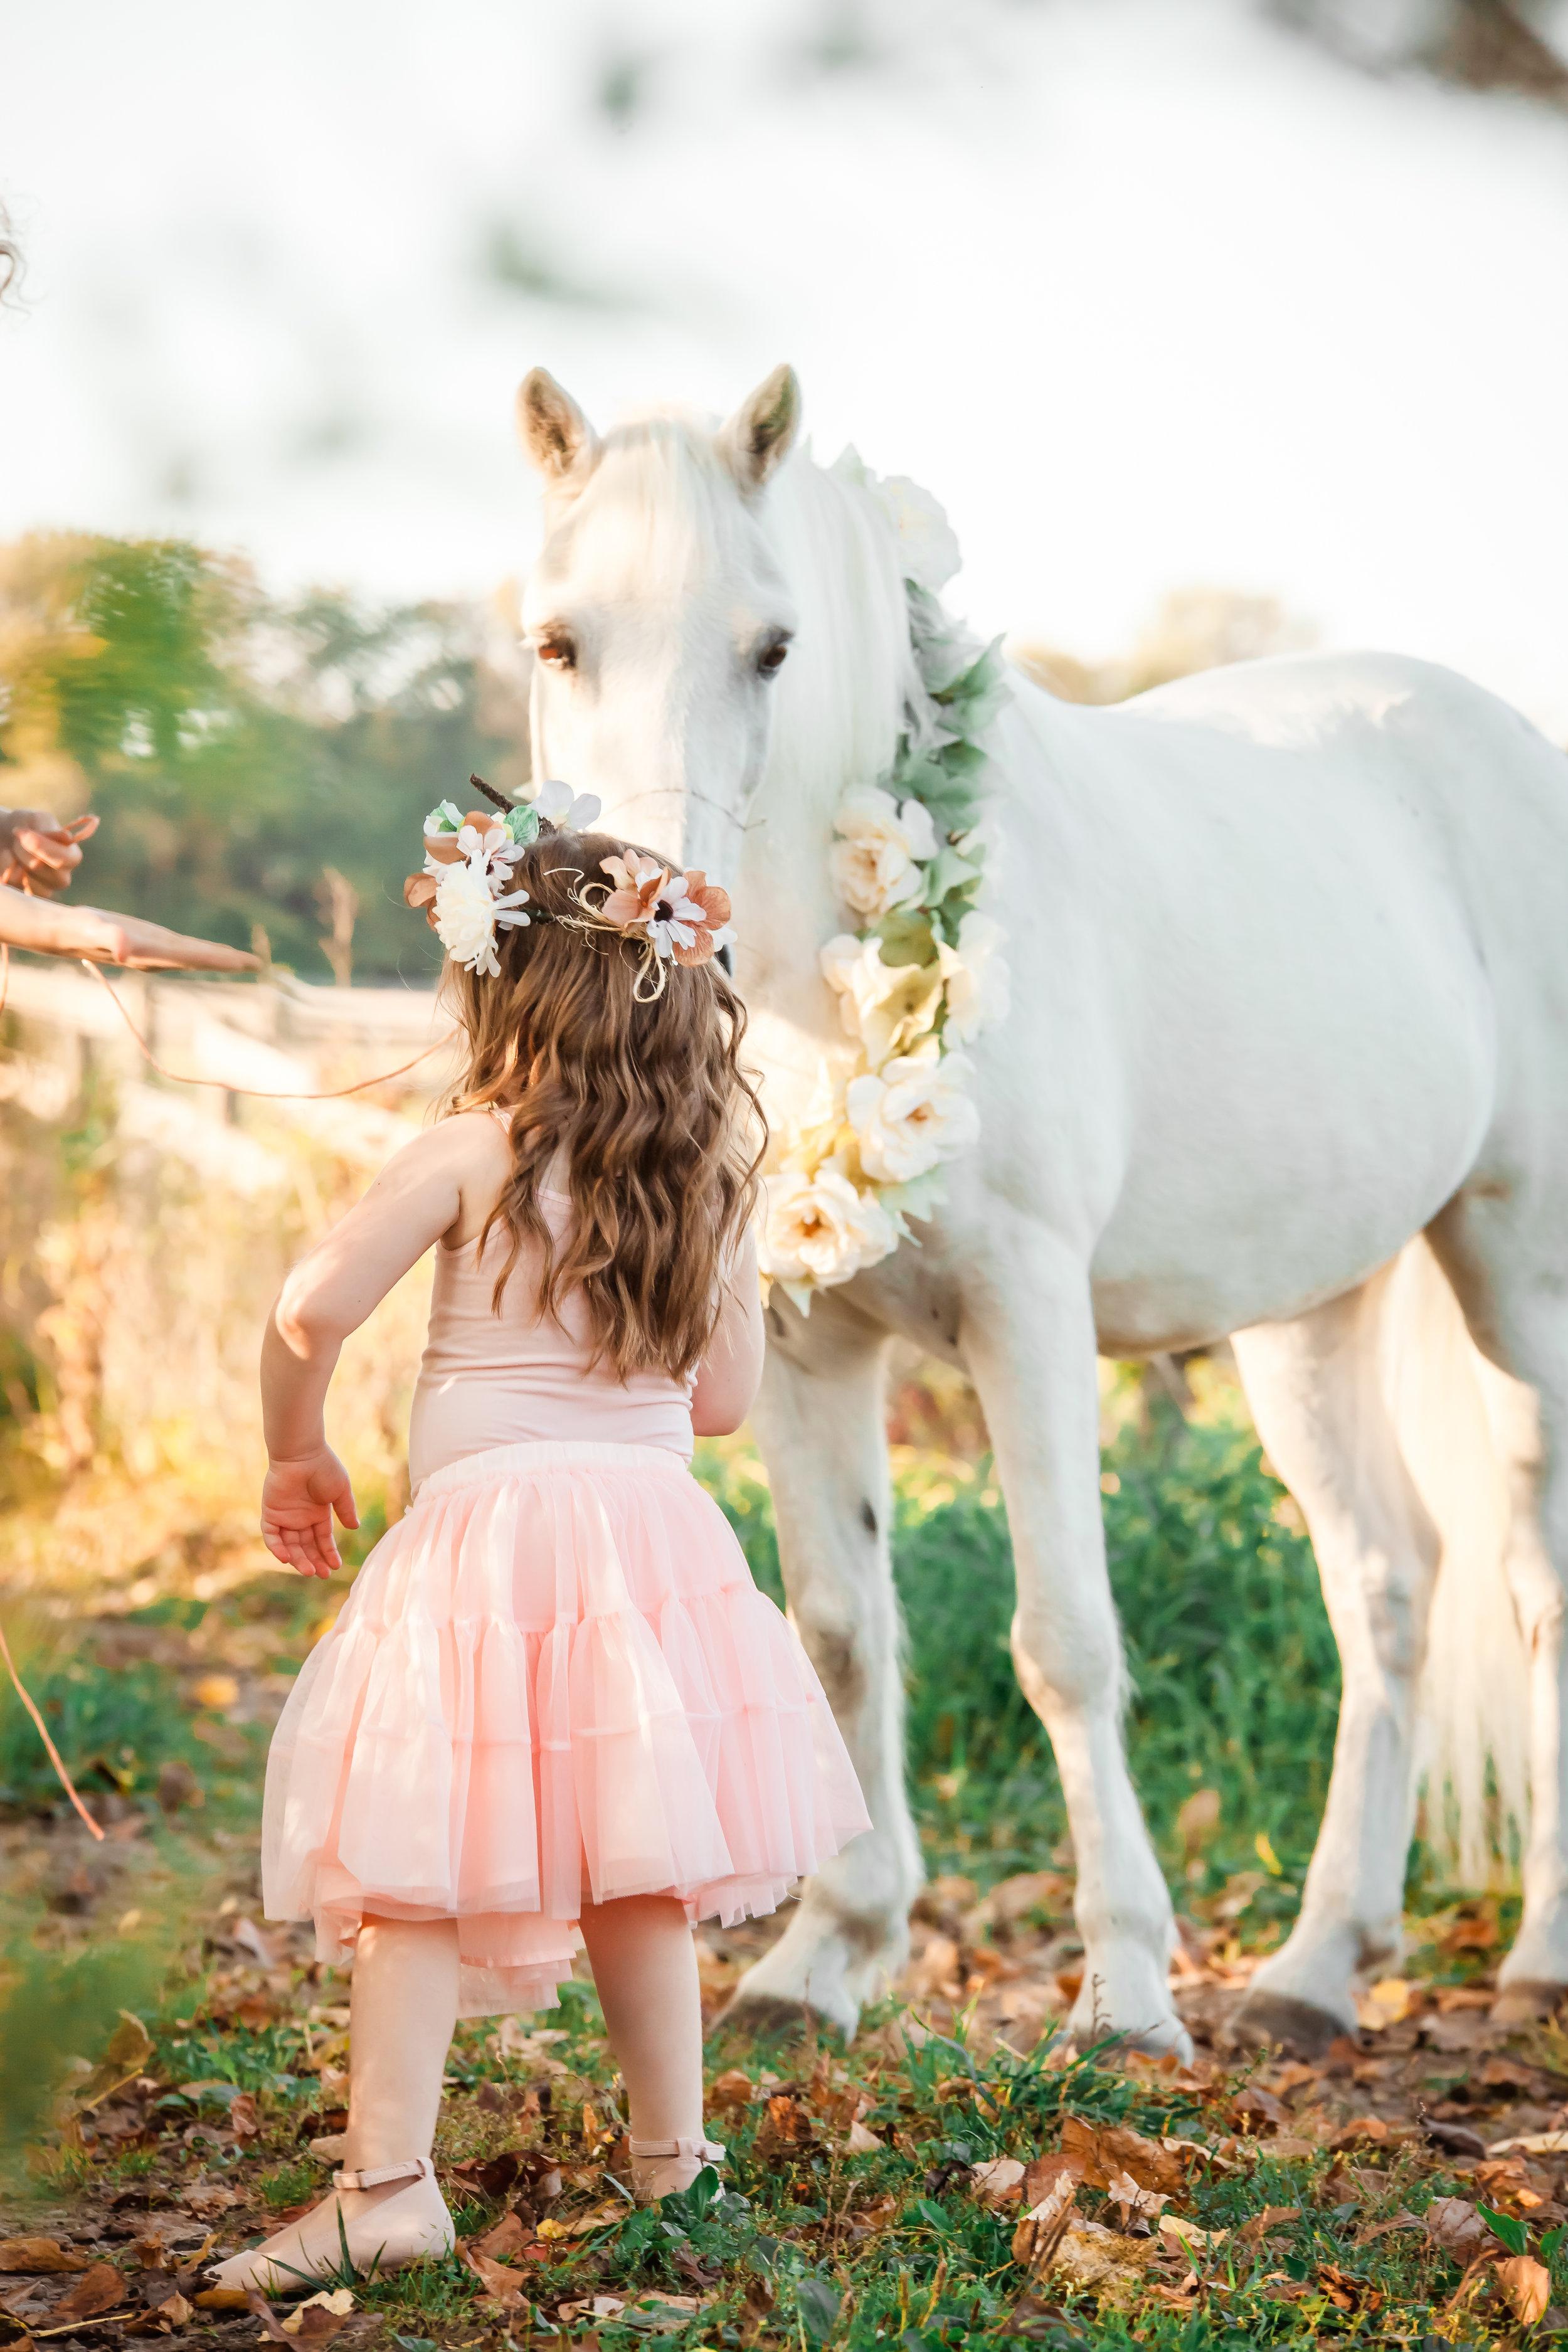 Amy D Photography Barrie Children & Family Photography Unicorn Mini Sessions Unicorn Photo Session- Little Girl Photo Session-24.jpg